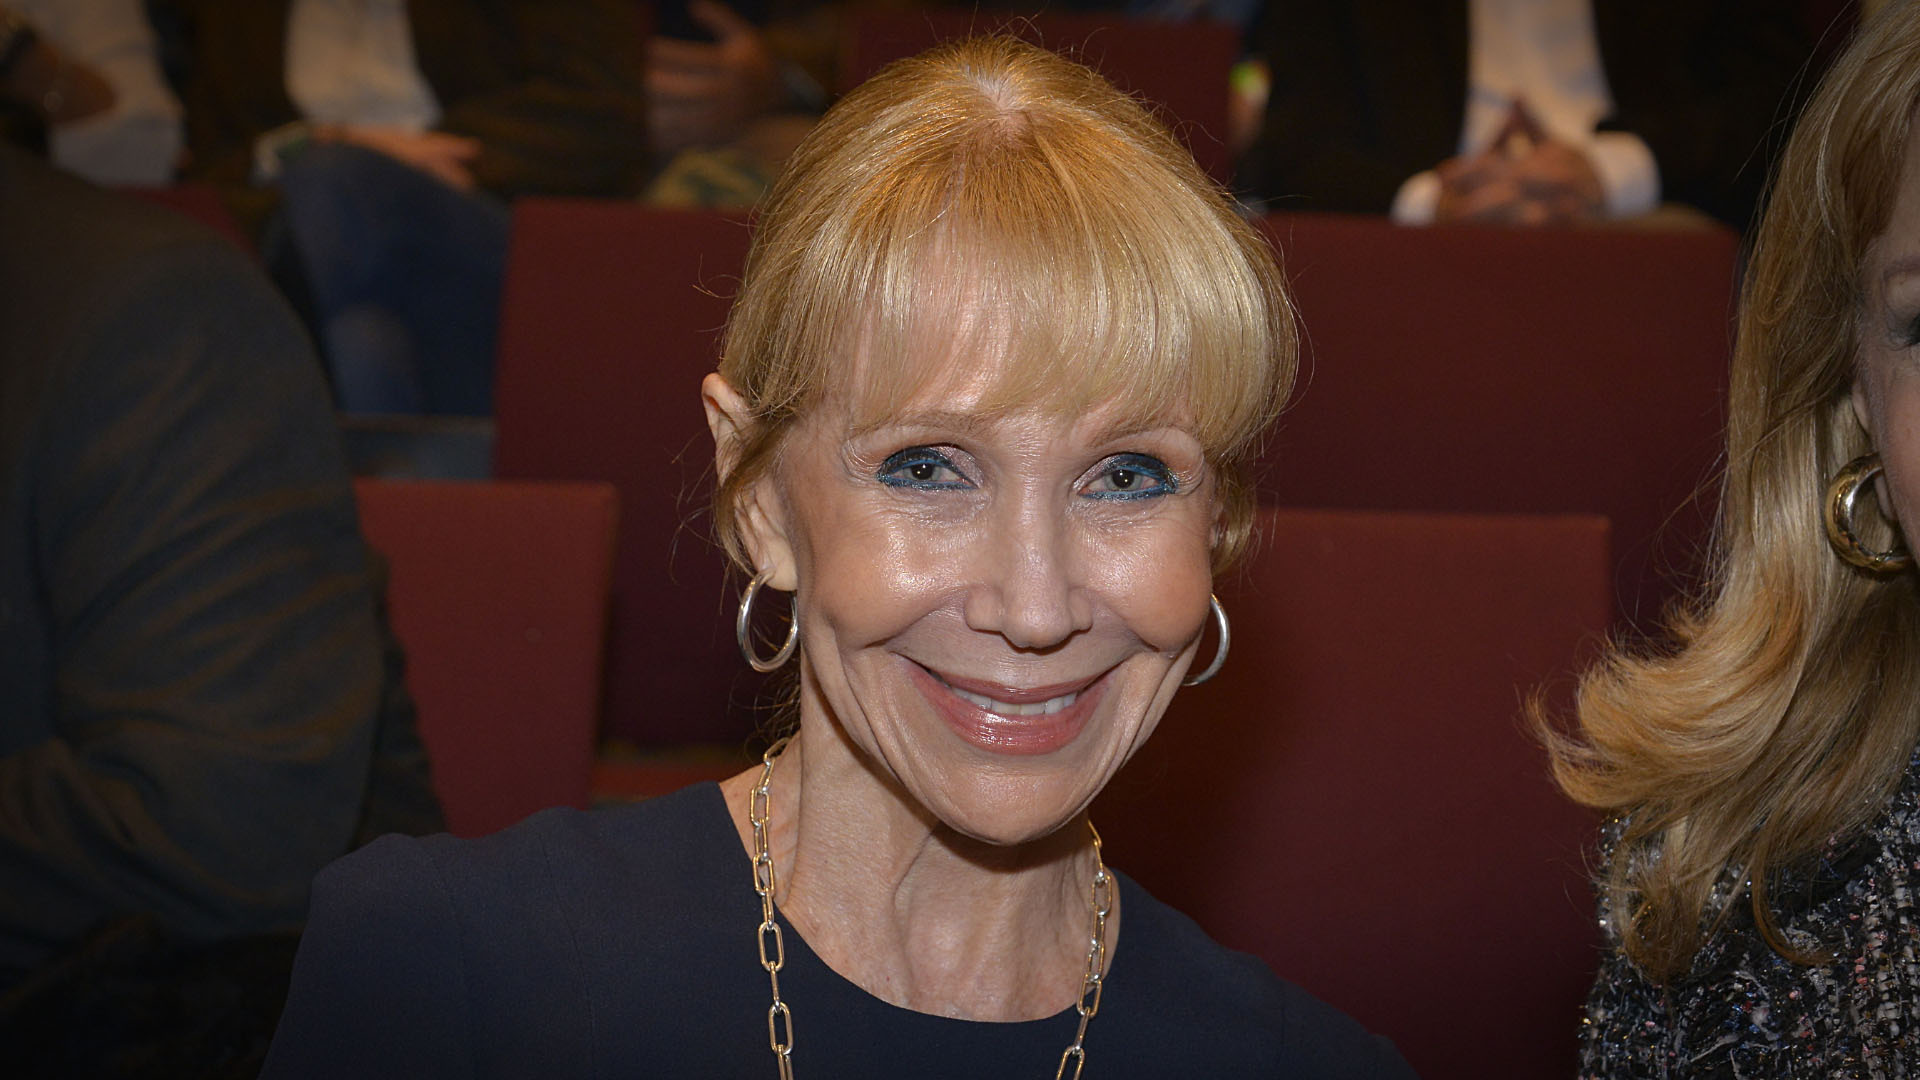 Evangelina Salazar